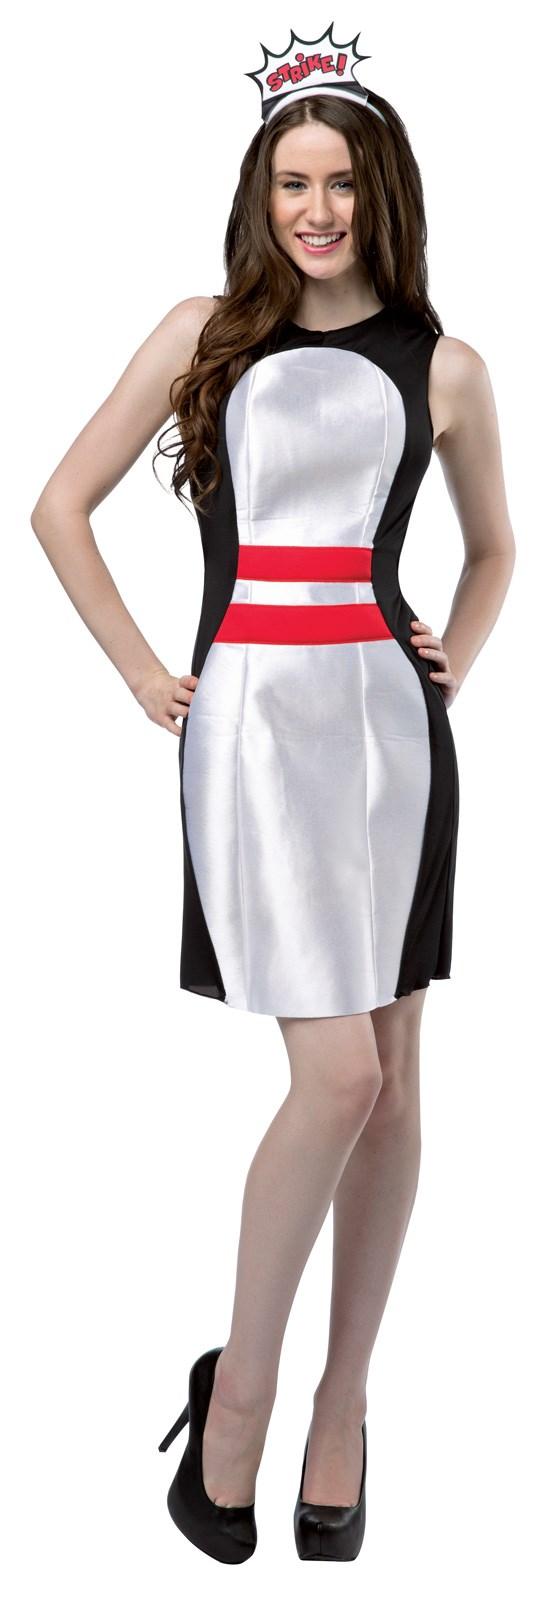 Bowling Pin Adult Dress Costume